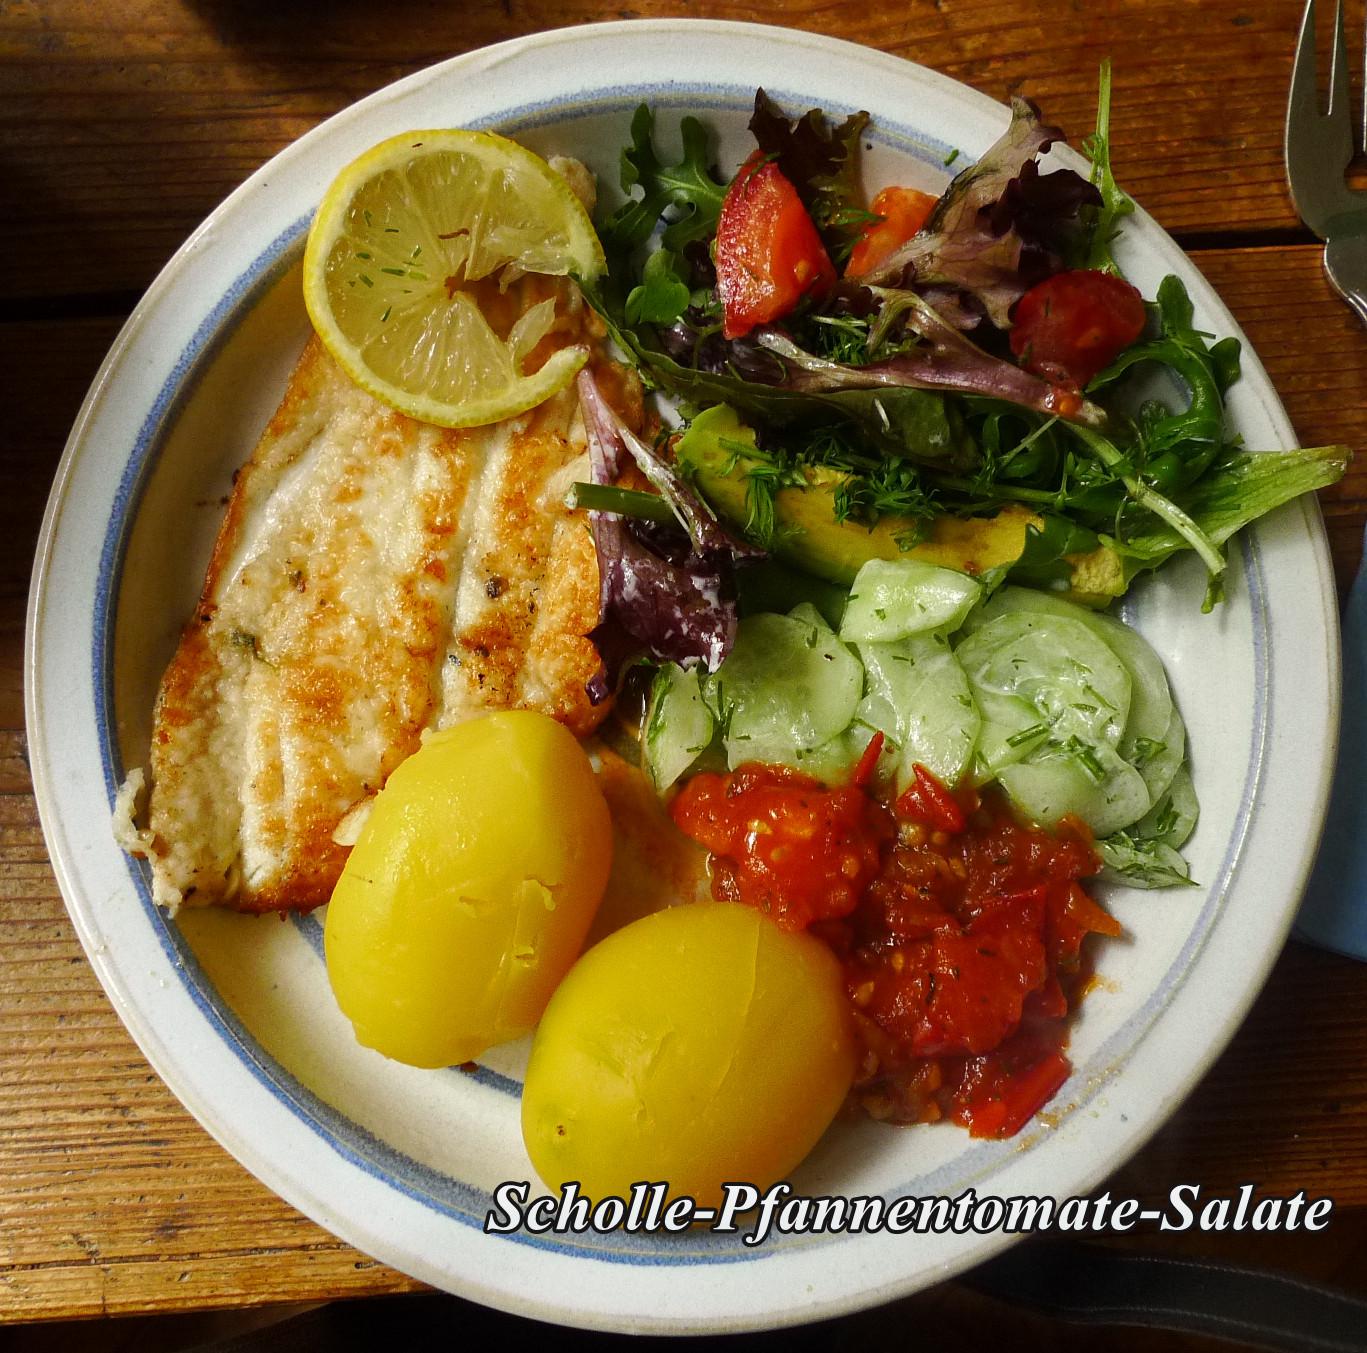 25.10.2013-Scholle-Salate-gebratene Tomate-Pellkartoffel